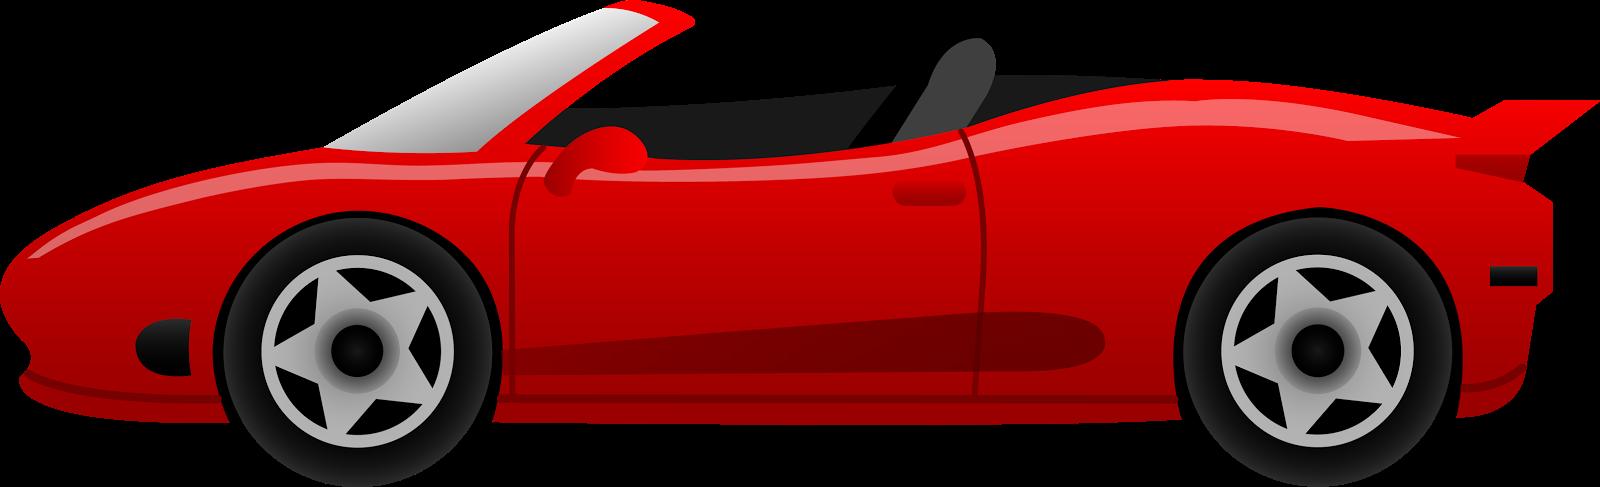 1600x487 Race Car Clipart Transparent Car